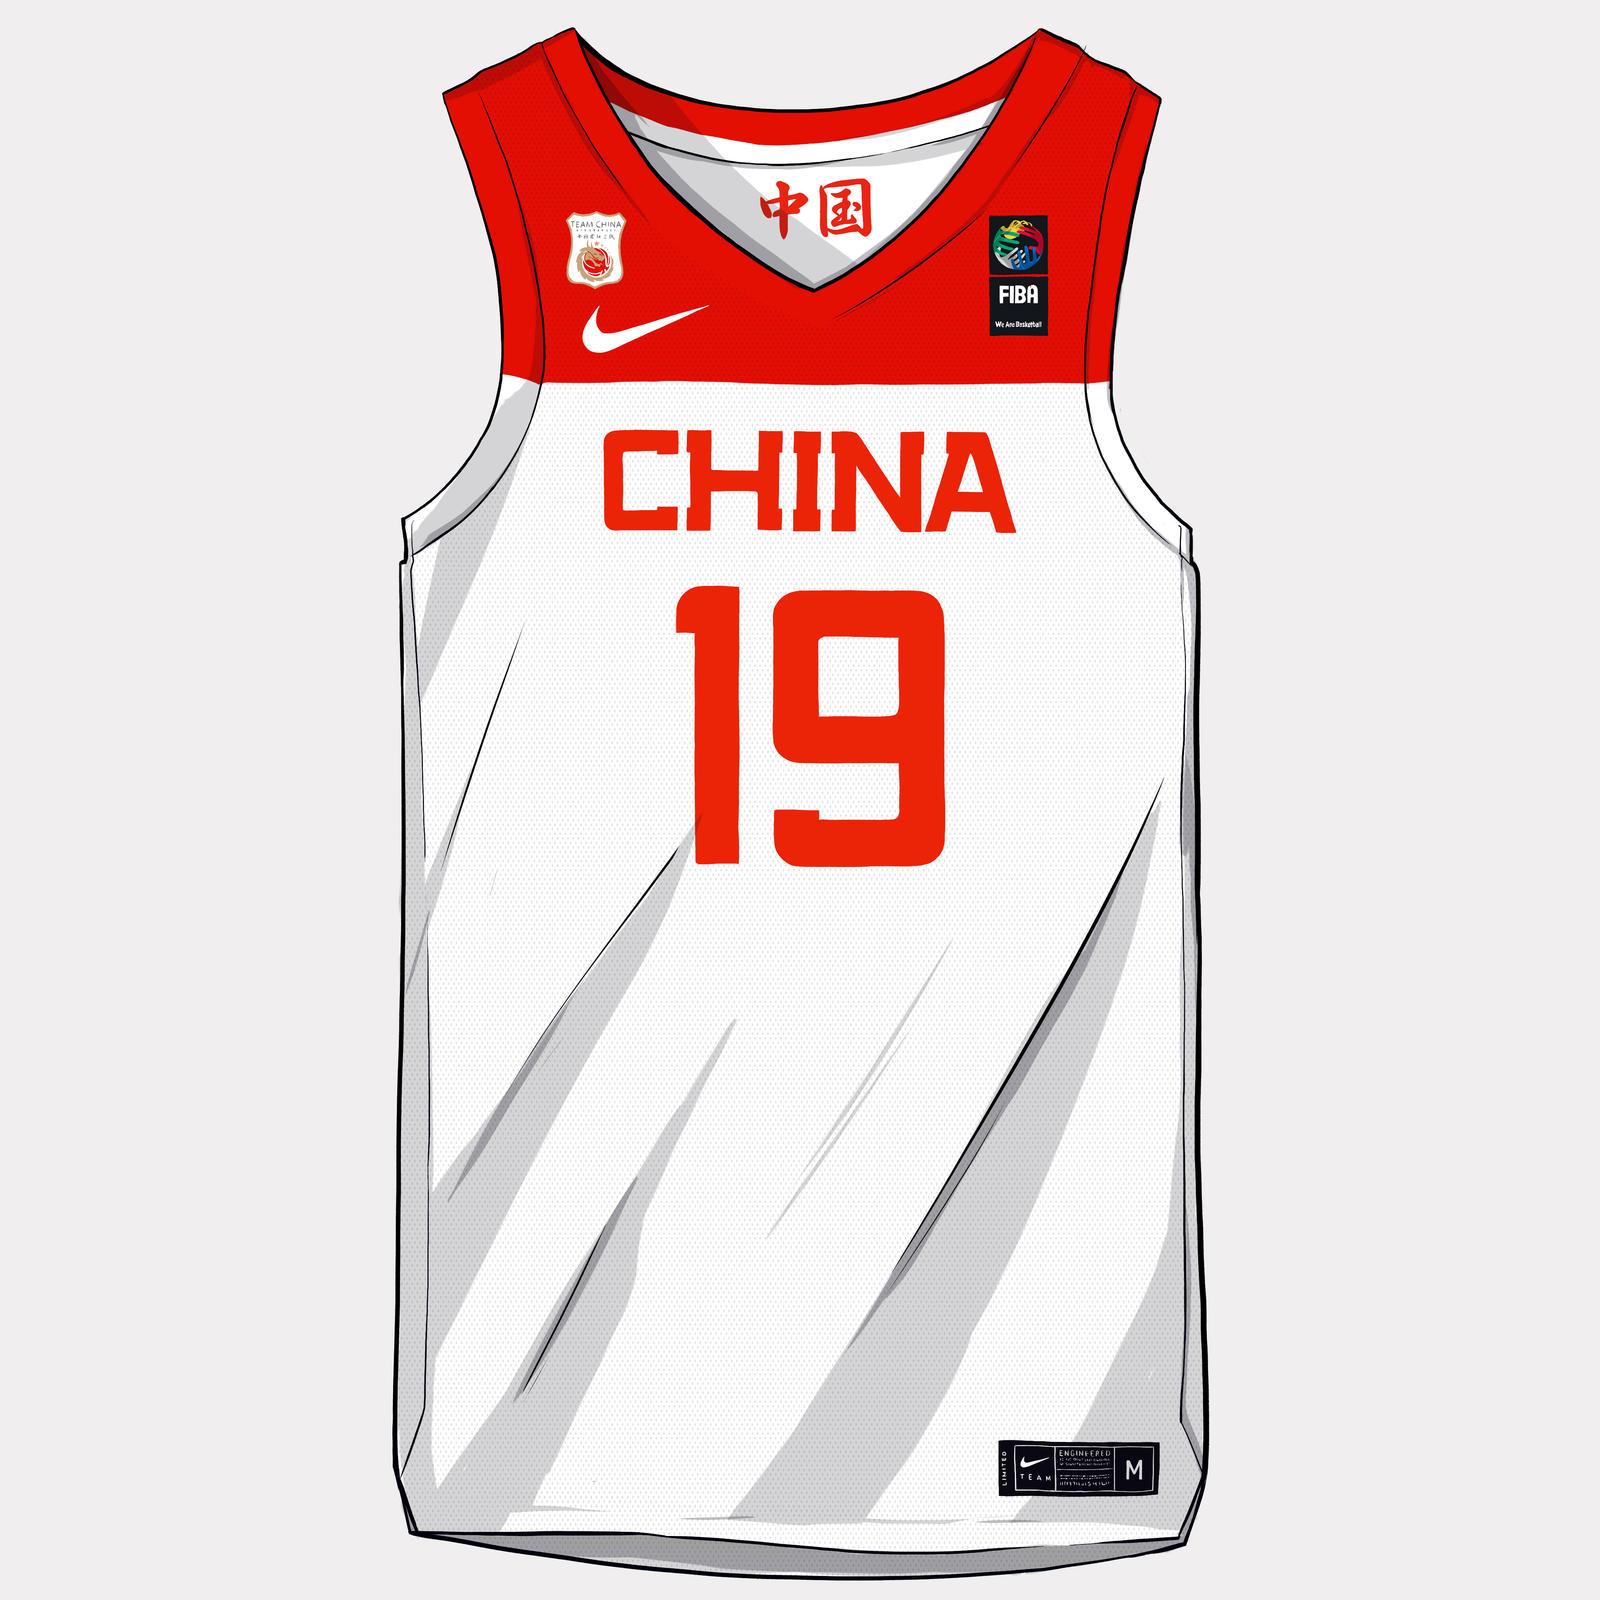 NikeNews_China19BasketballUniforms_chinawhite1x1v2_square_1600.jpg